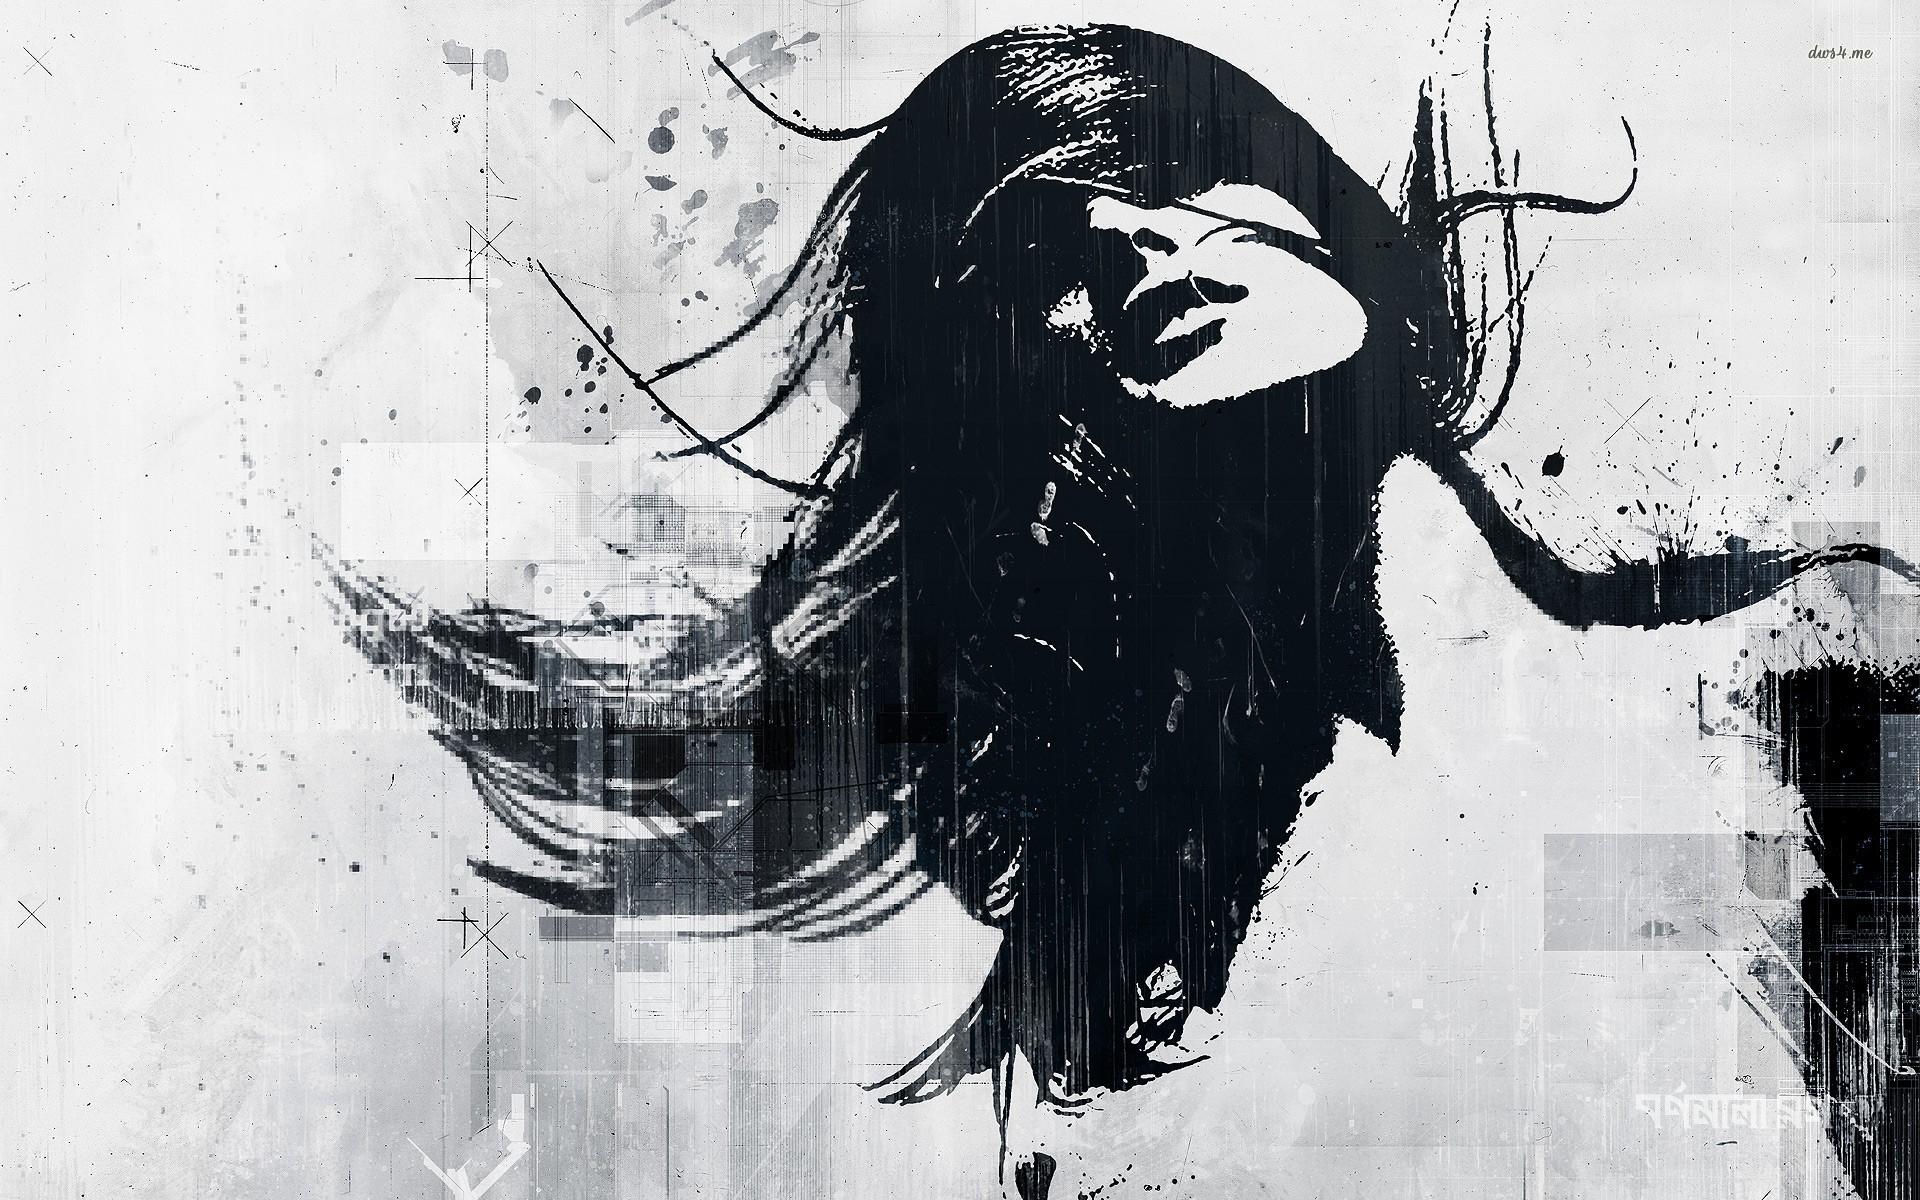 graffiti-black-and-white-wallpaper-1080p-on-hd-wallpaper-jpg.158